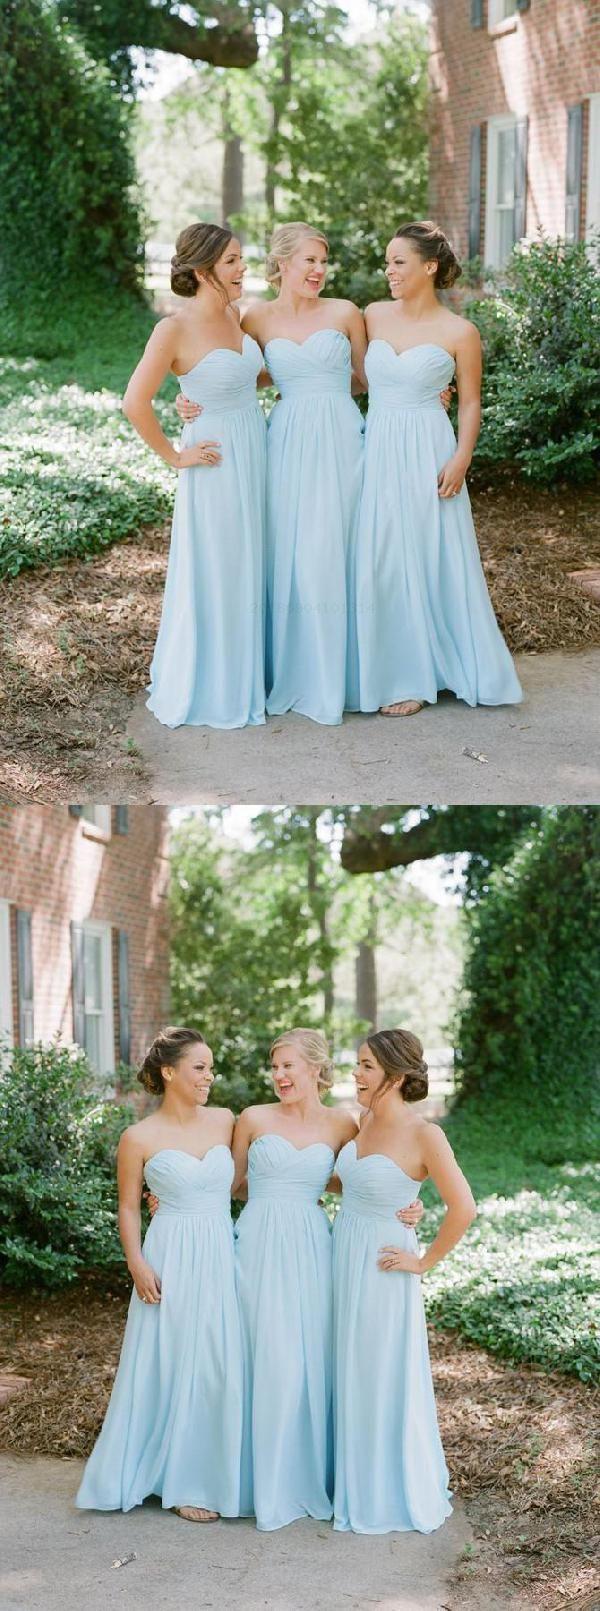 6c3c1aeffd Discount Fetching Light Blue Bridesmaid Dresses